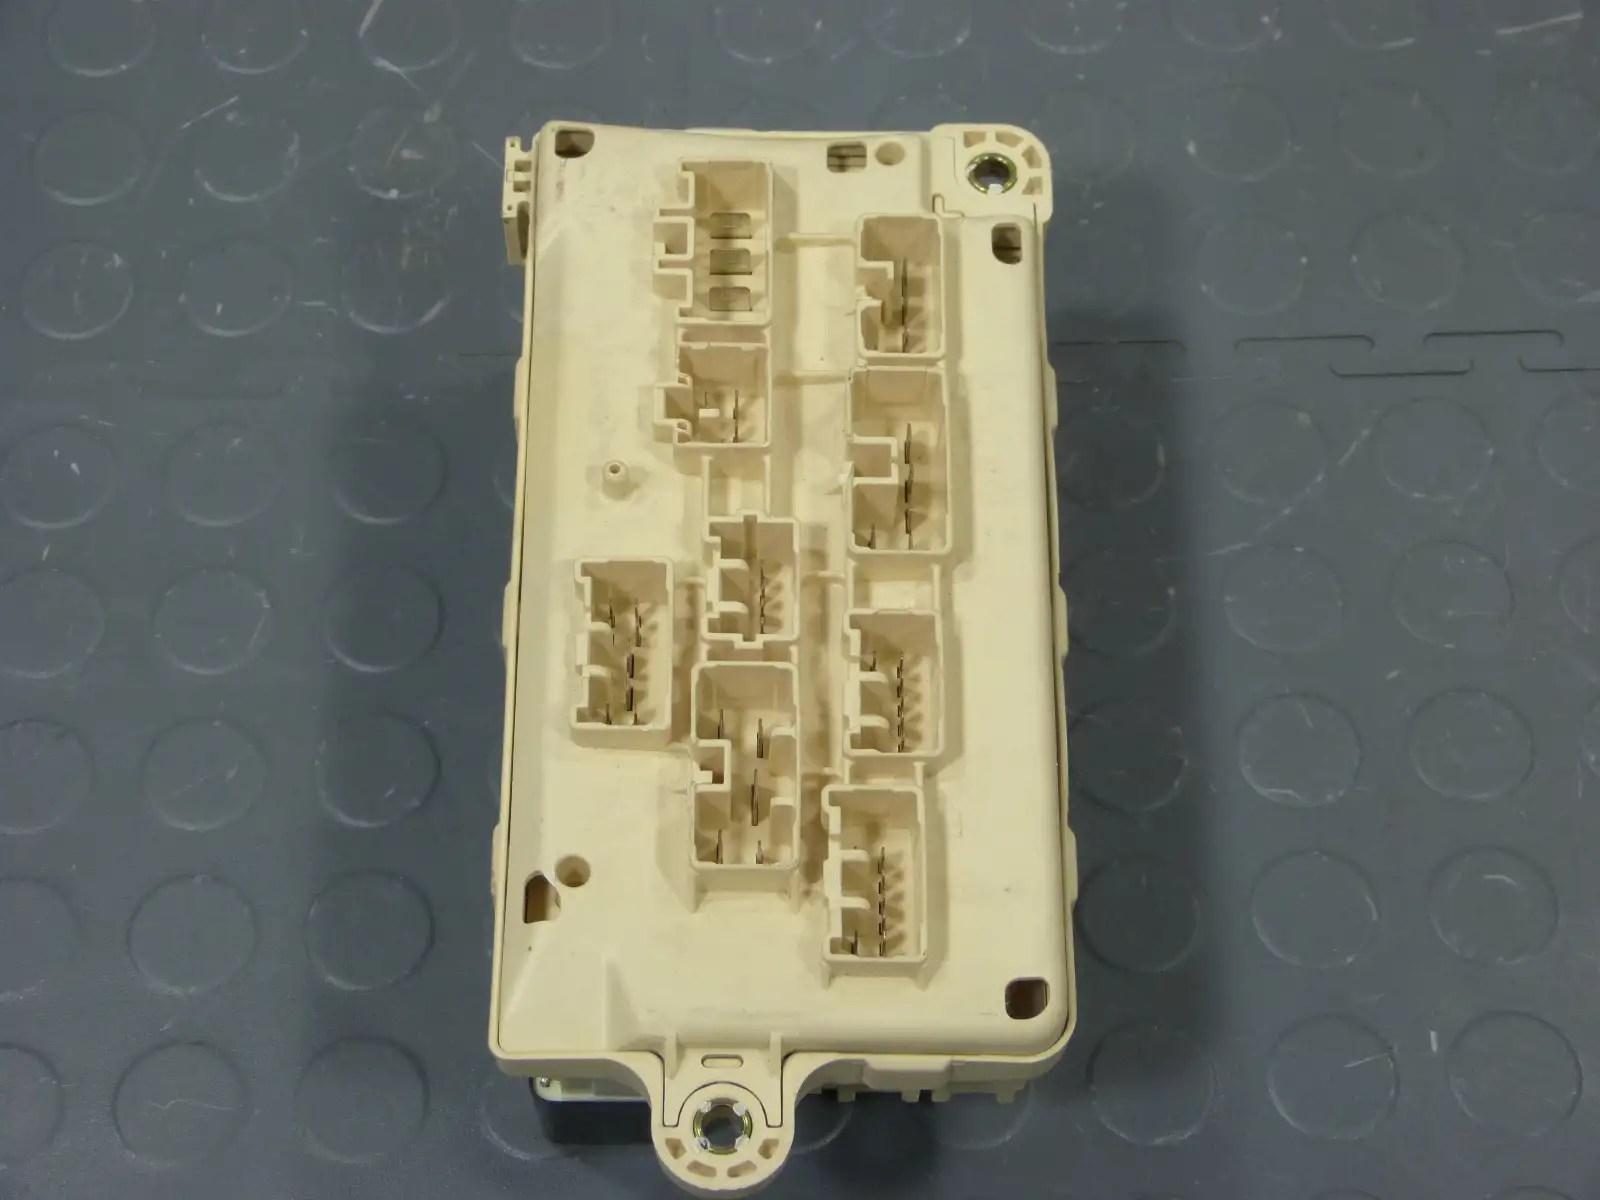 hight resolution of 95 lexus ls400 underhood fuse box assembly relays fuses fuse box 1993 lexus ls400 fuse box